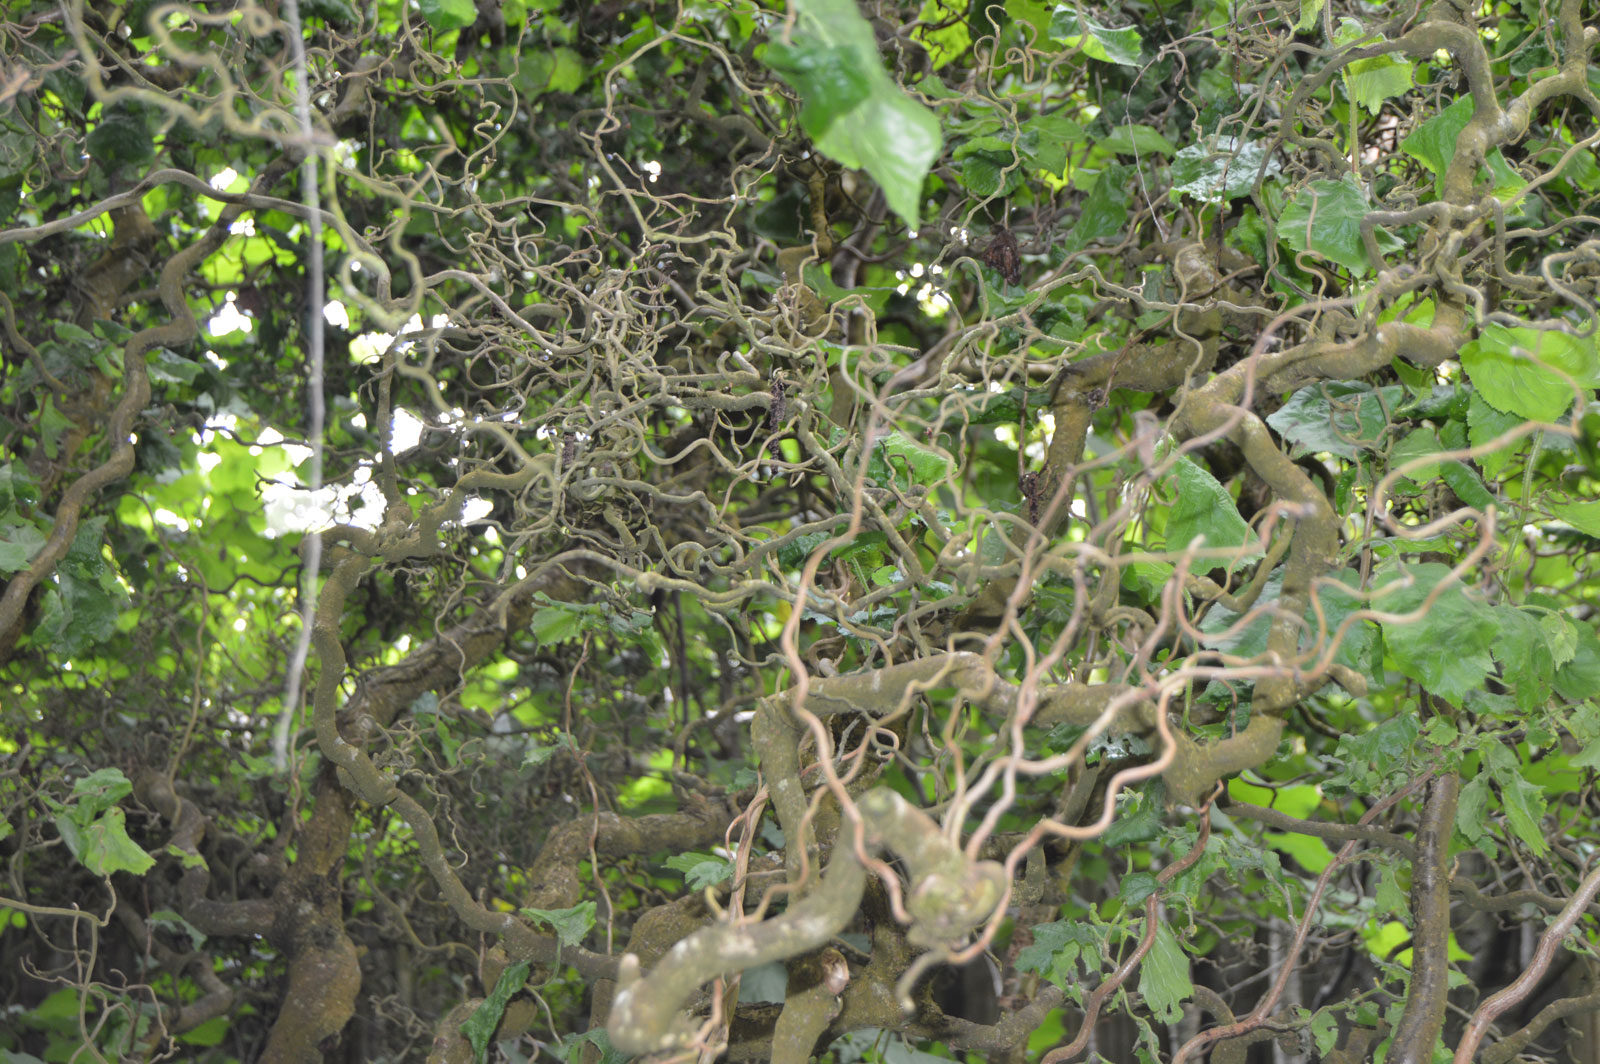 Harry lauder walking stick trees - Corylus Avellana Contorta Harry Lauders Walking Stick 5_seeds